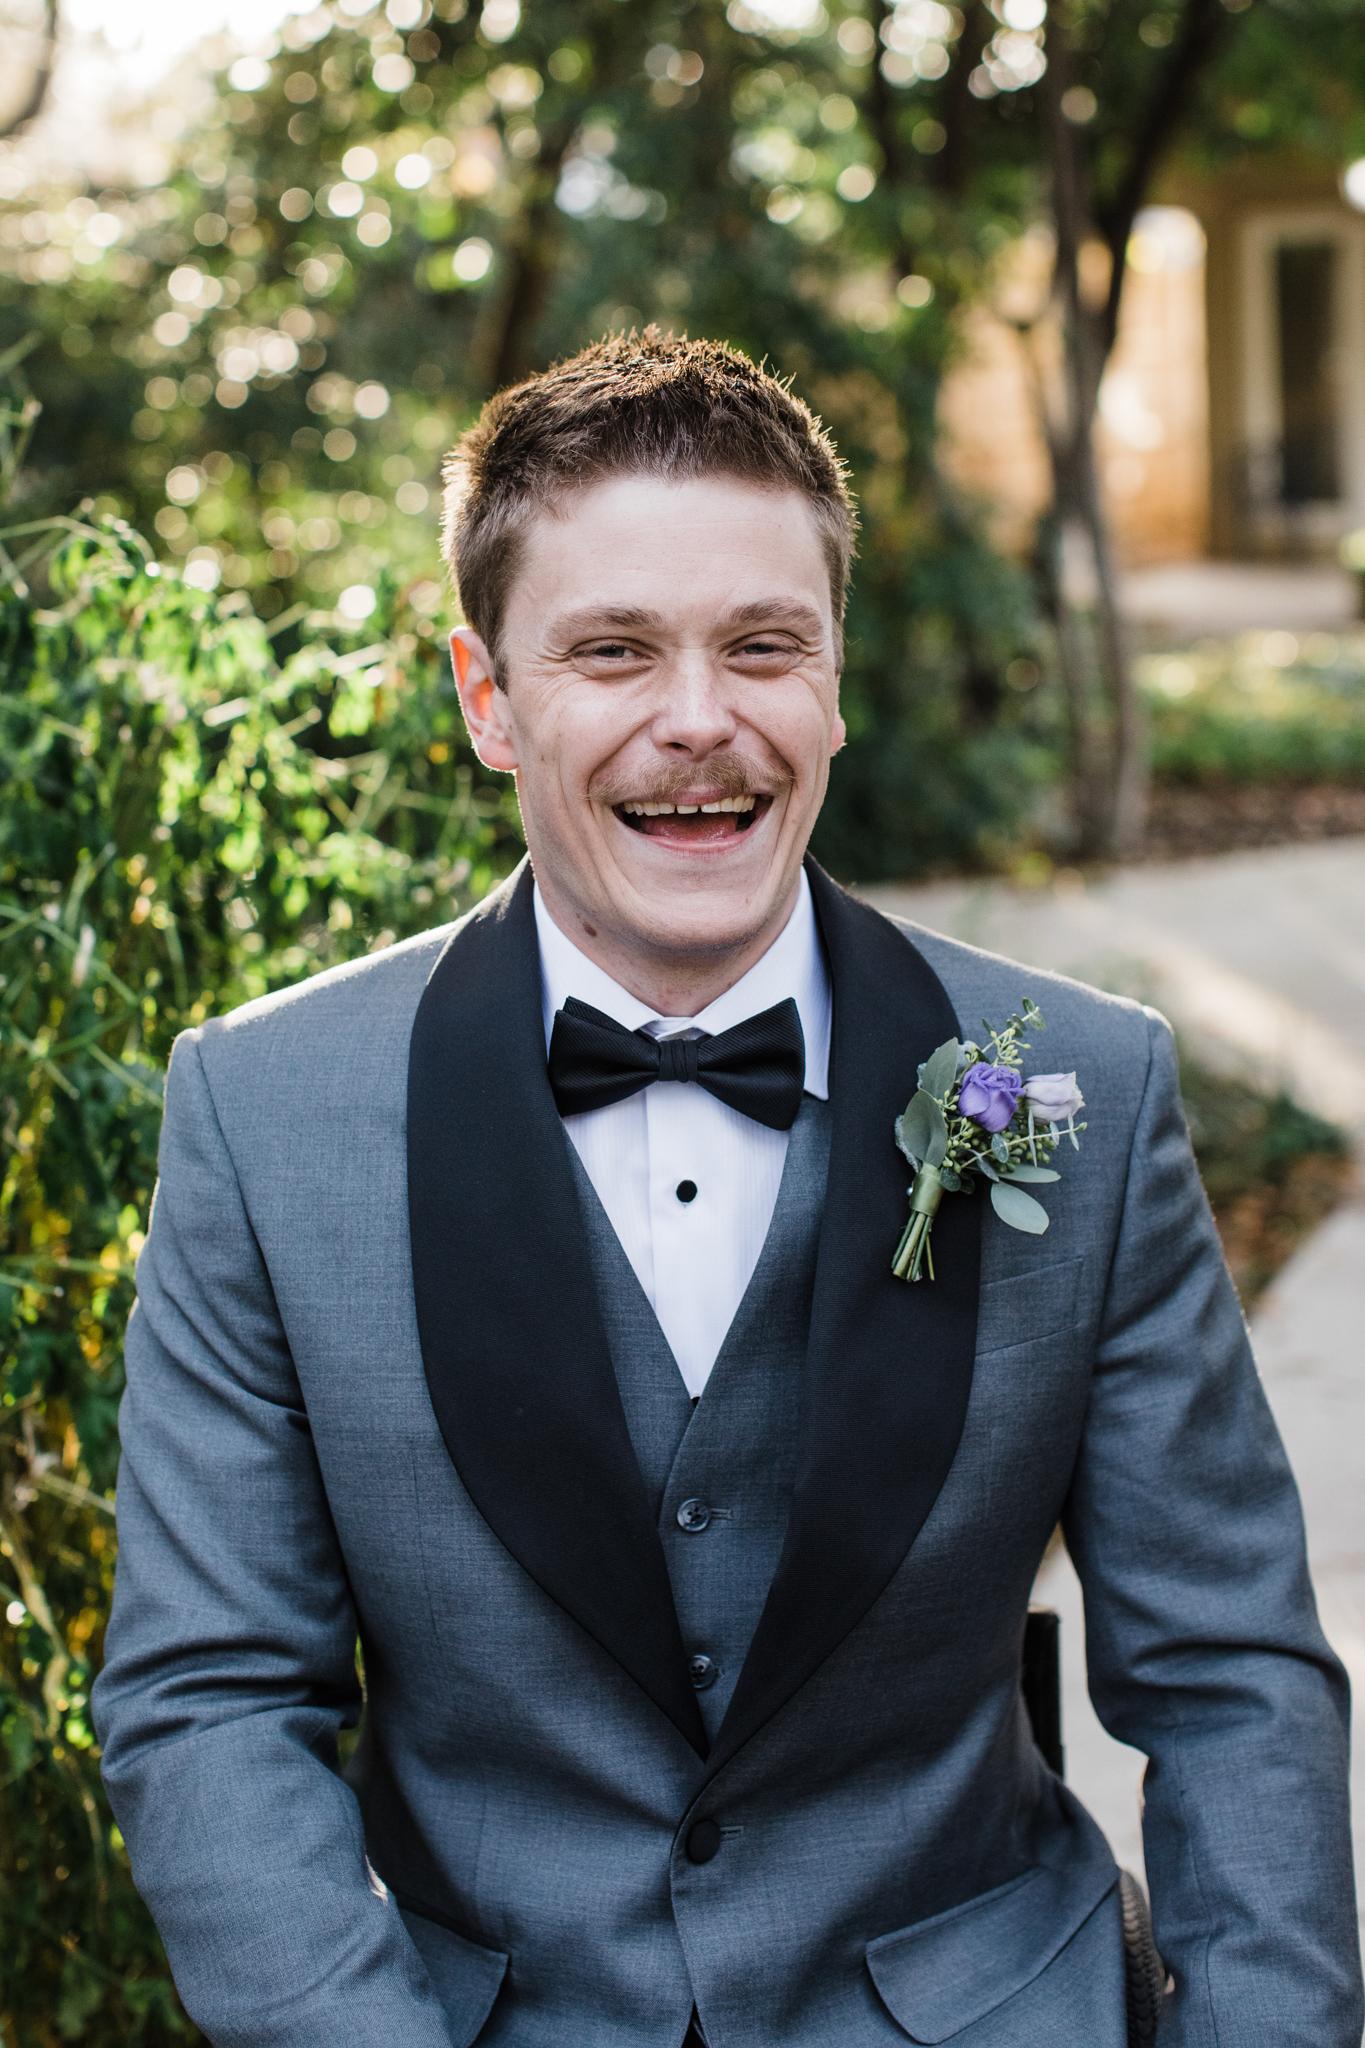 groom laughing portrait